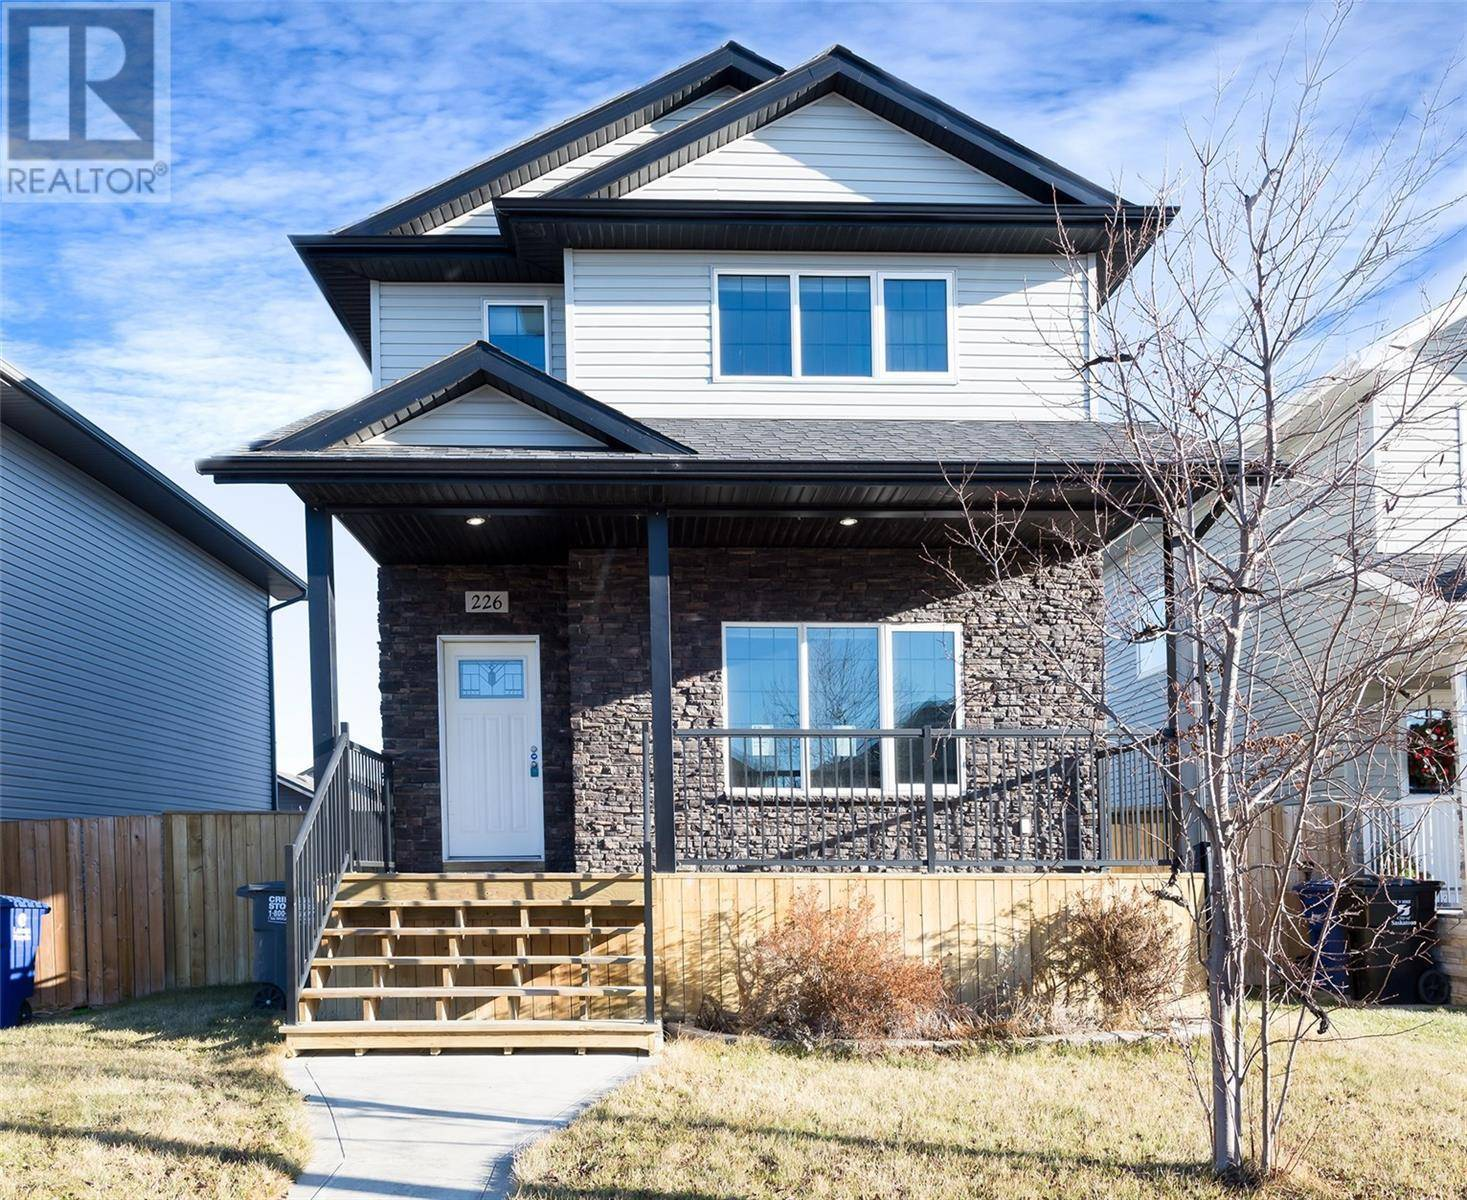 House for sale at 226 Geary Cres Saskatoon Saskatchewan - MLS: SK793107